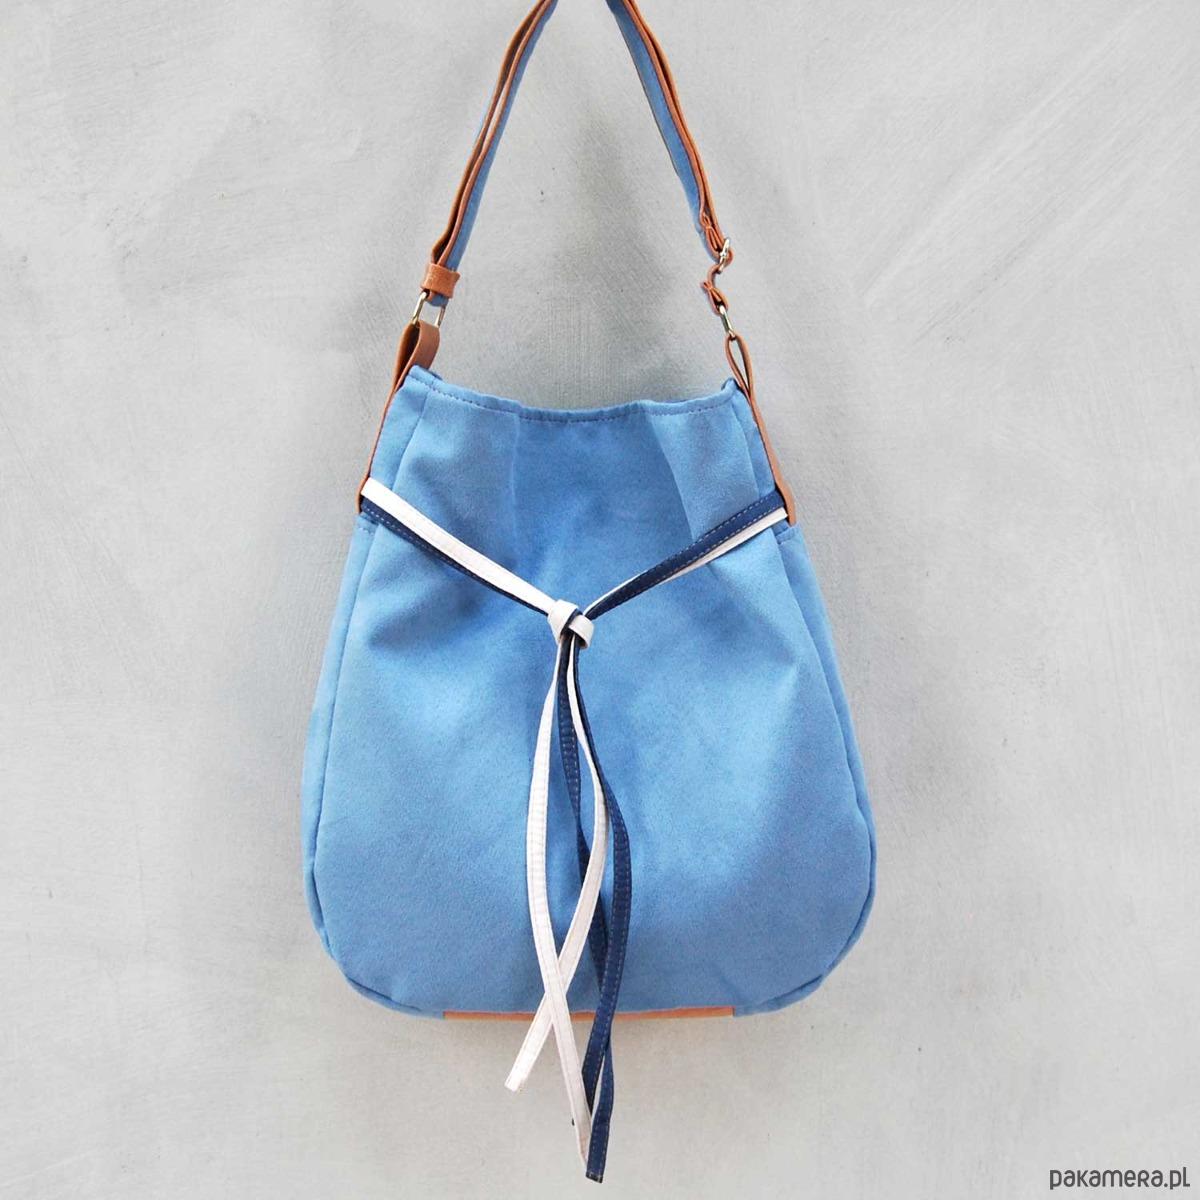 8dd0d75dfc451 SIMPLY BAG - duża torba worek - niebieska - torby na ramię - damskie -  Pakamera.pl